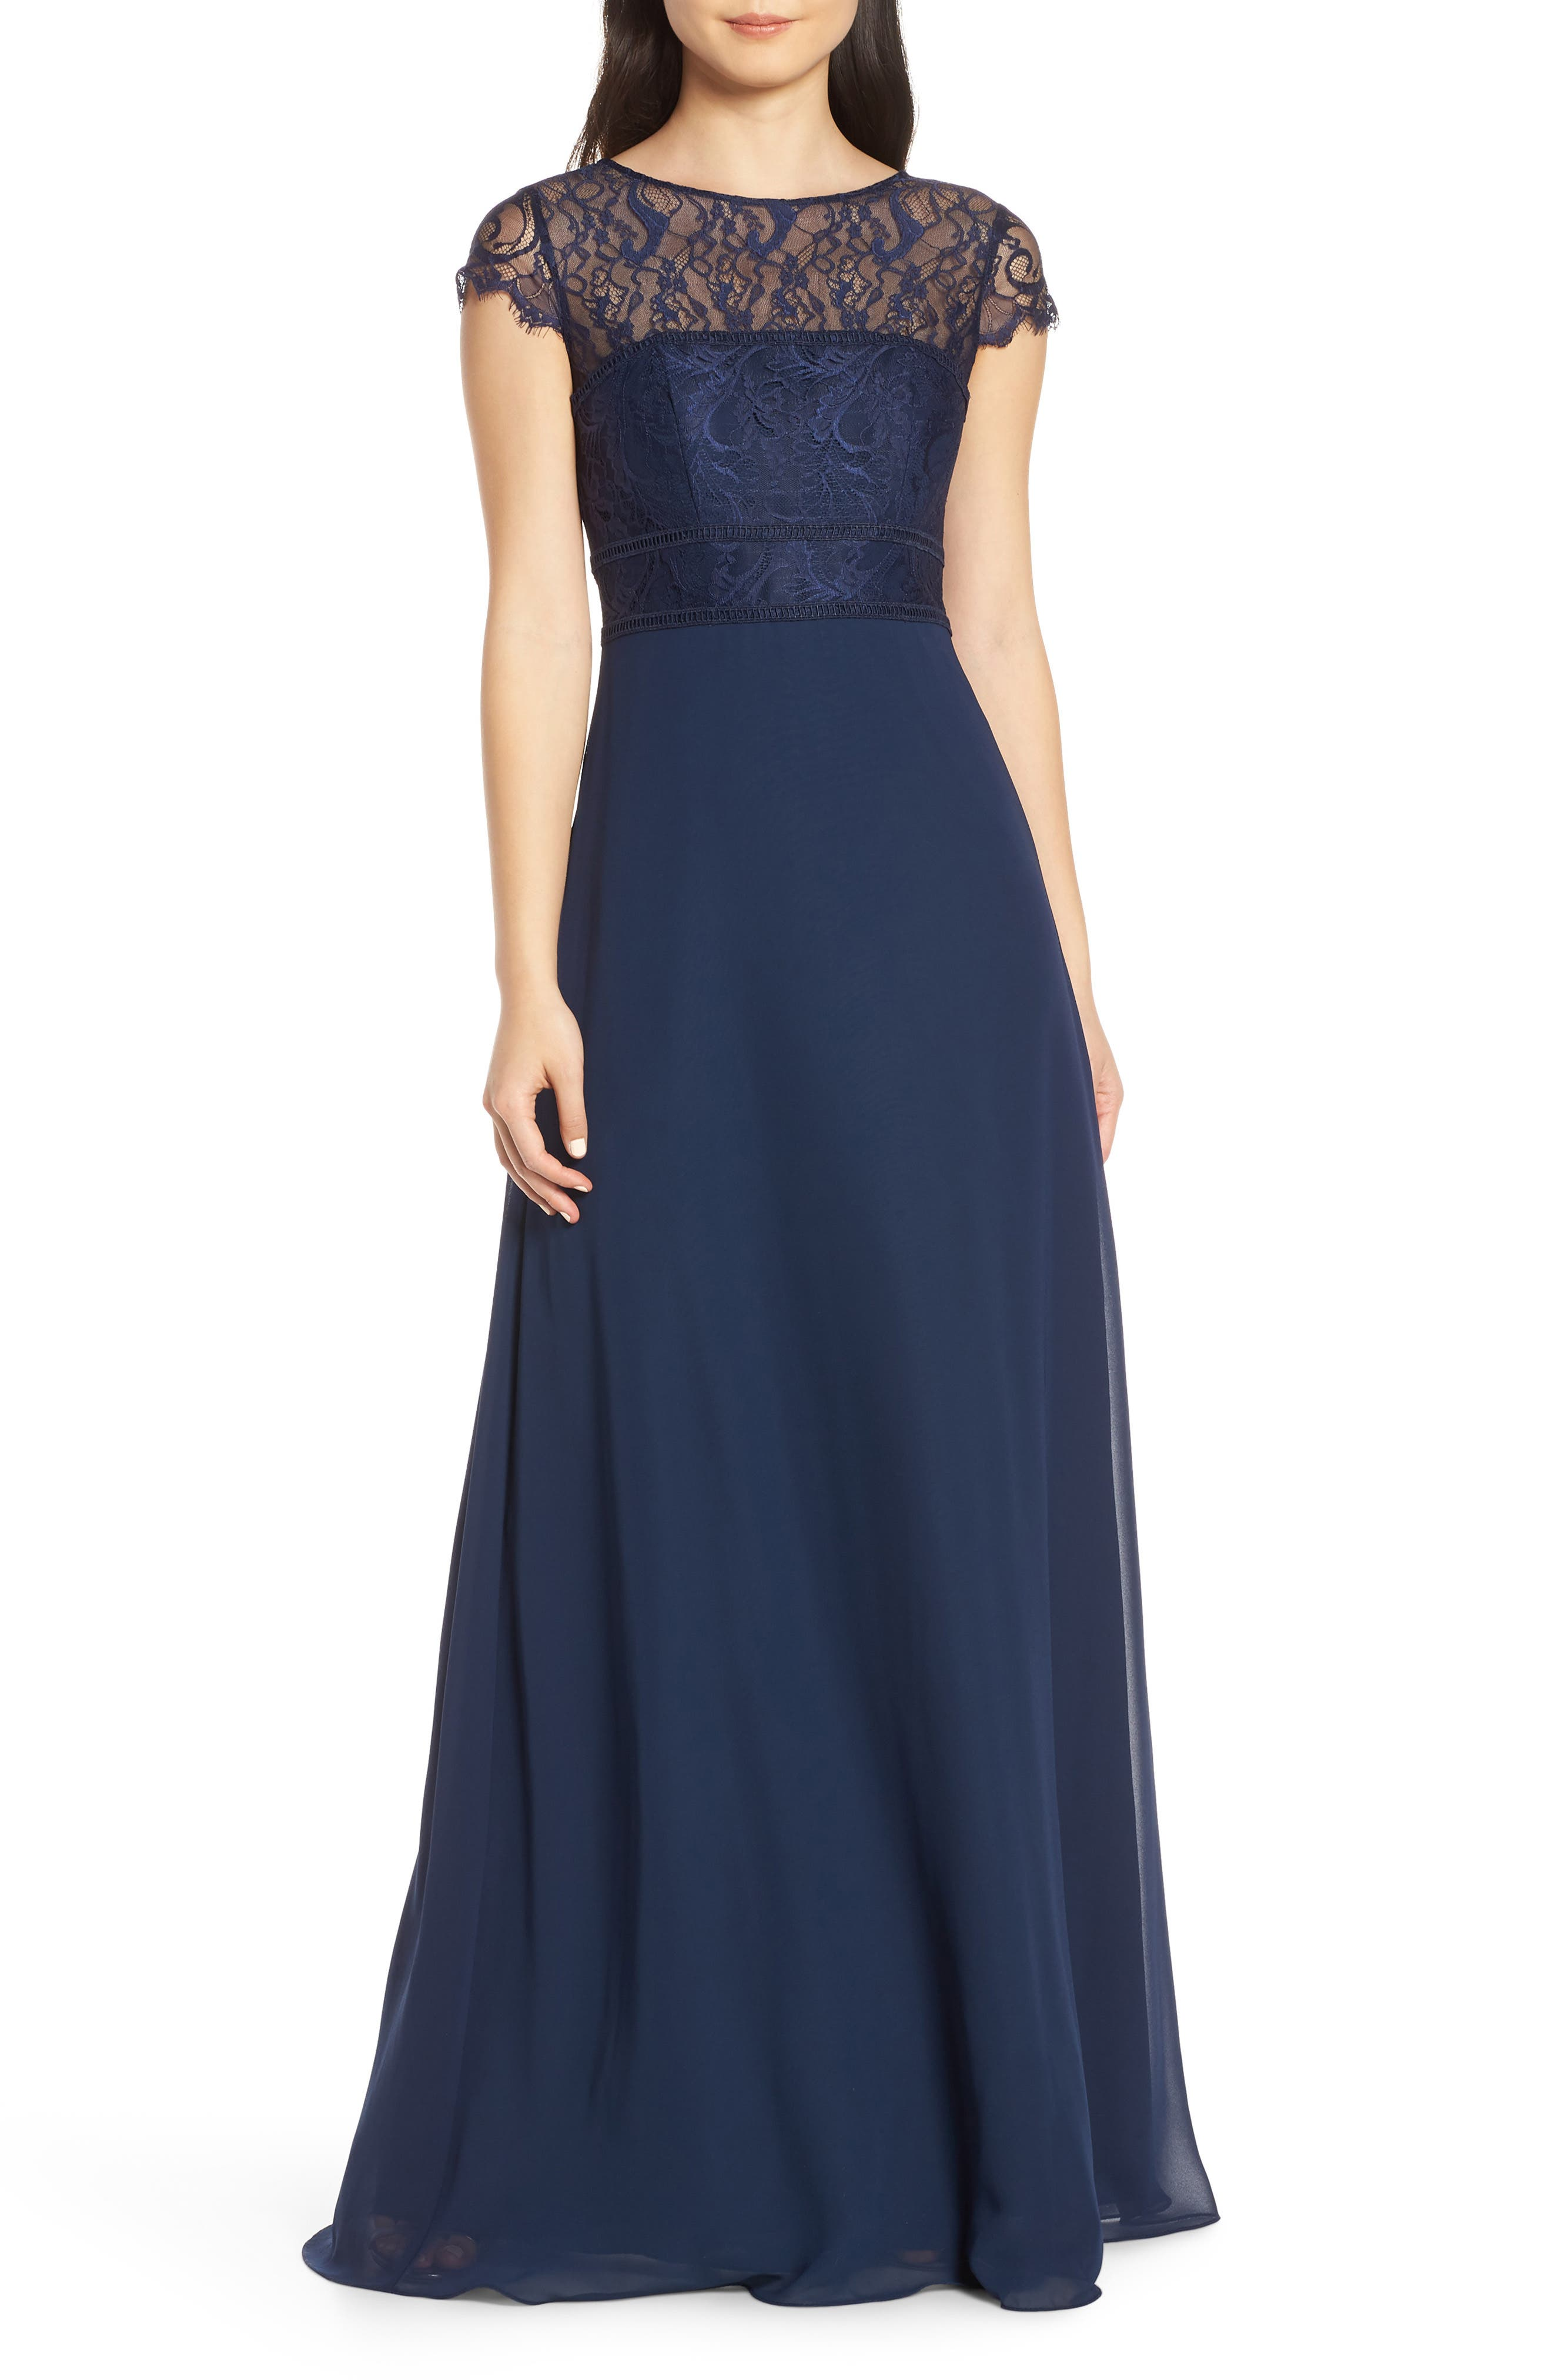 Hayley Paige Occasions Lace Bodice Chiffon Evening Dress, Blue